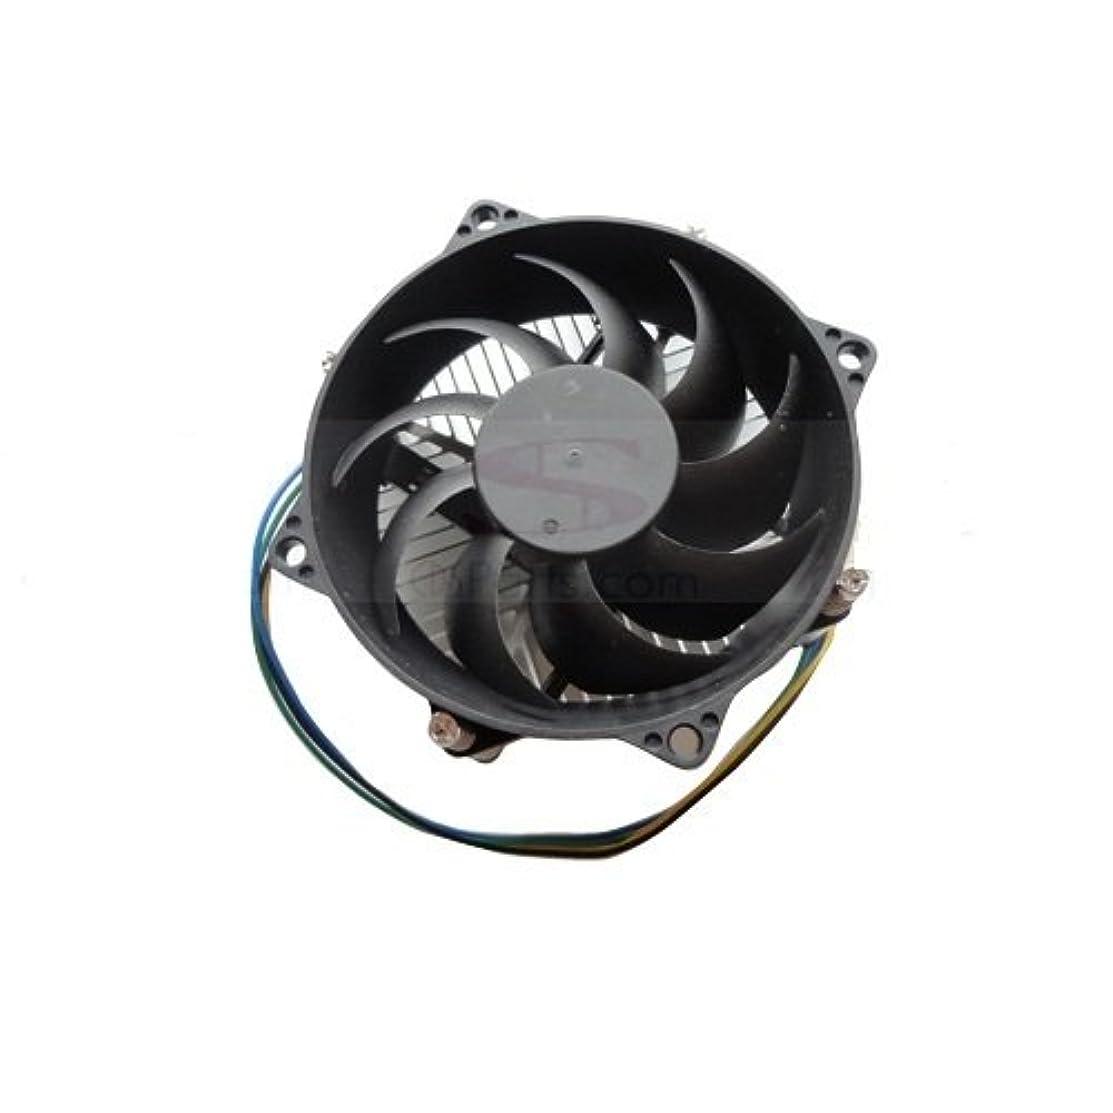 HI10800024 New Genuine Acer Aspire X1420 X1420G X1920 Veriton X270 Cpu Fan & Heatsink